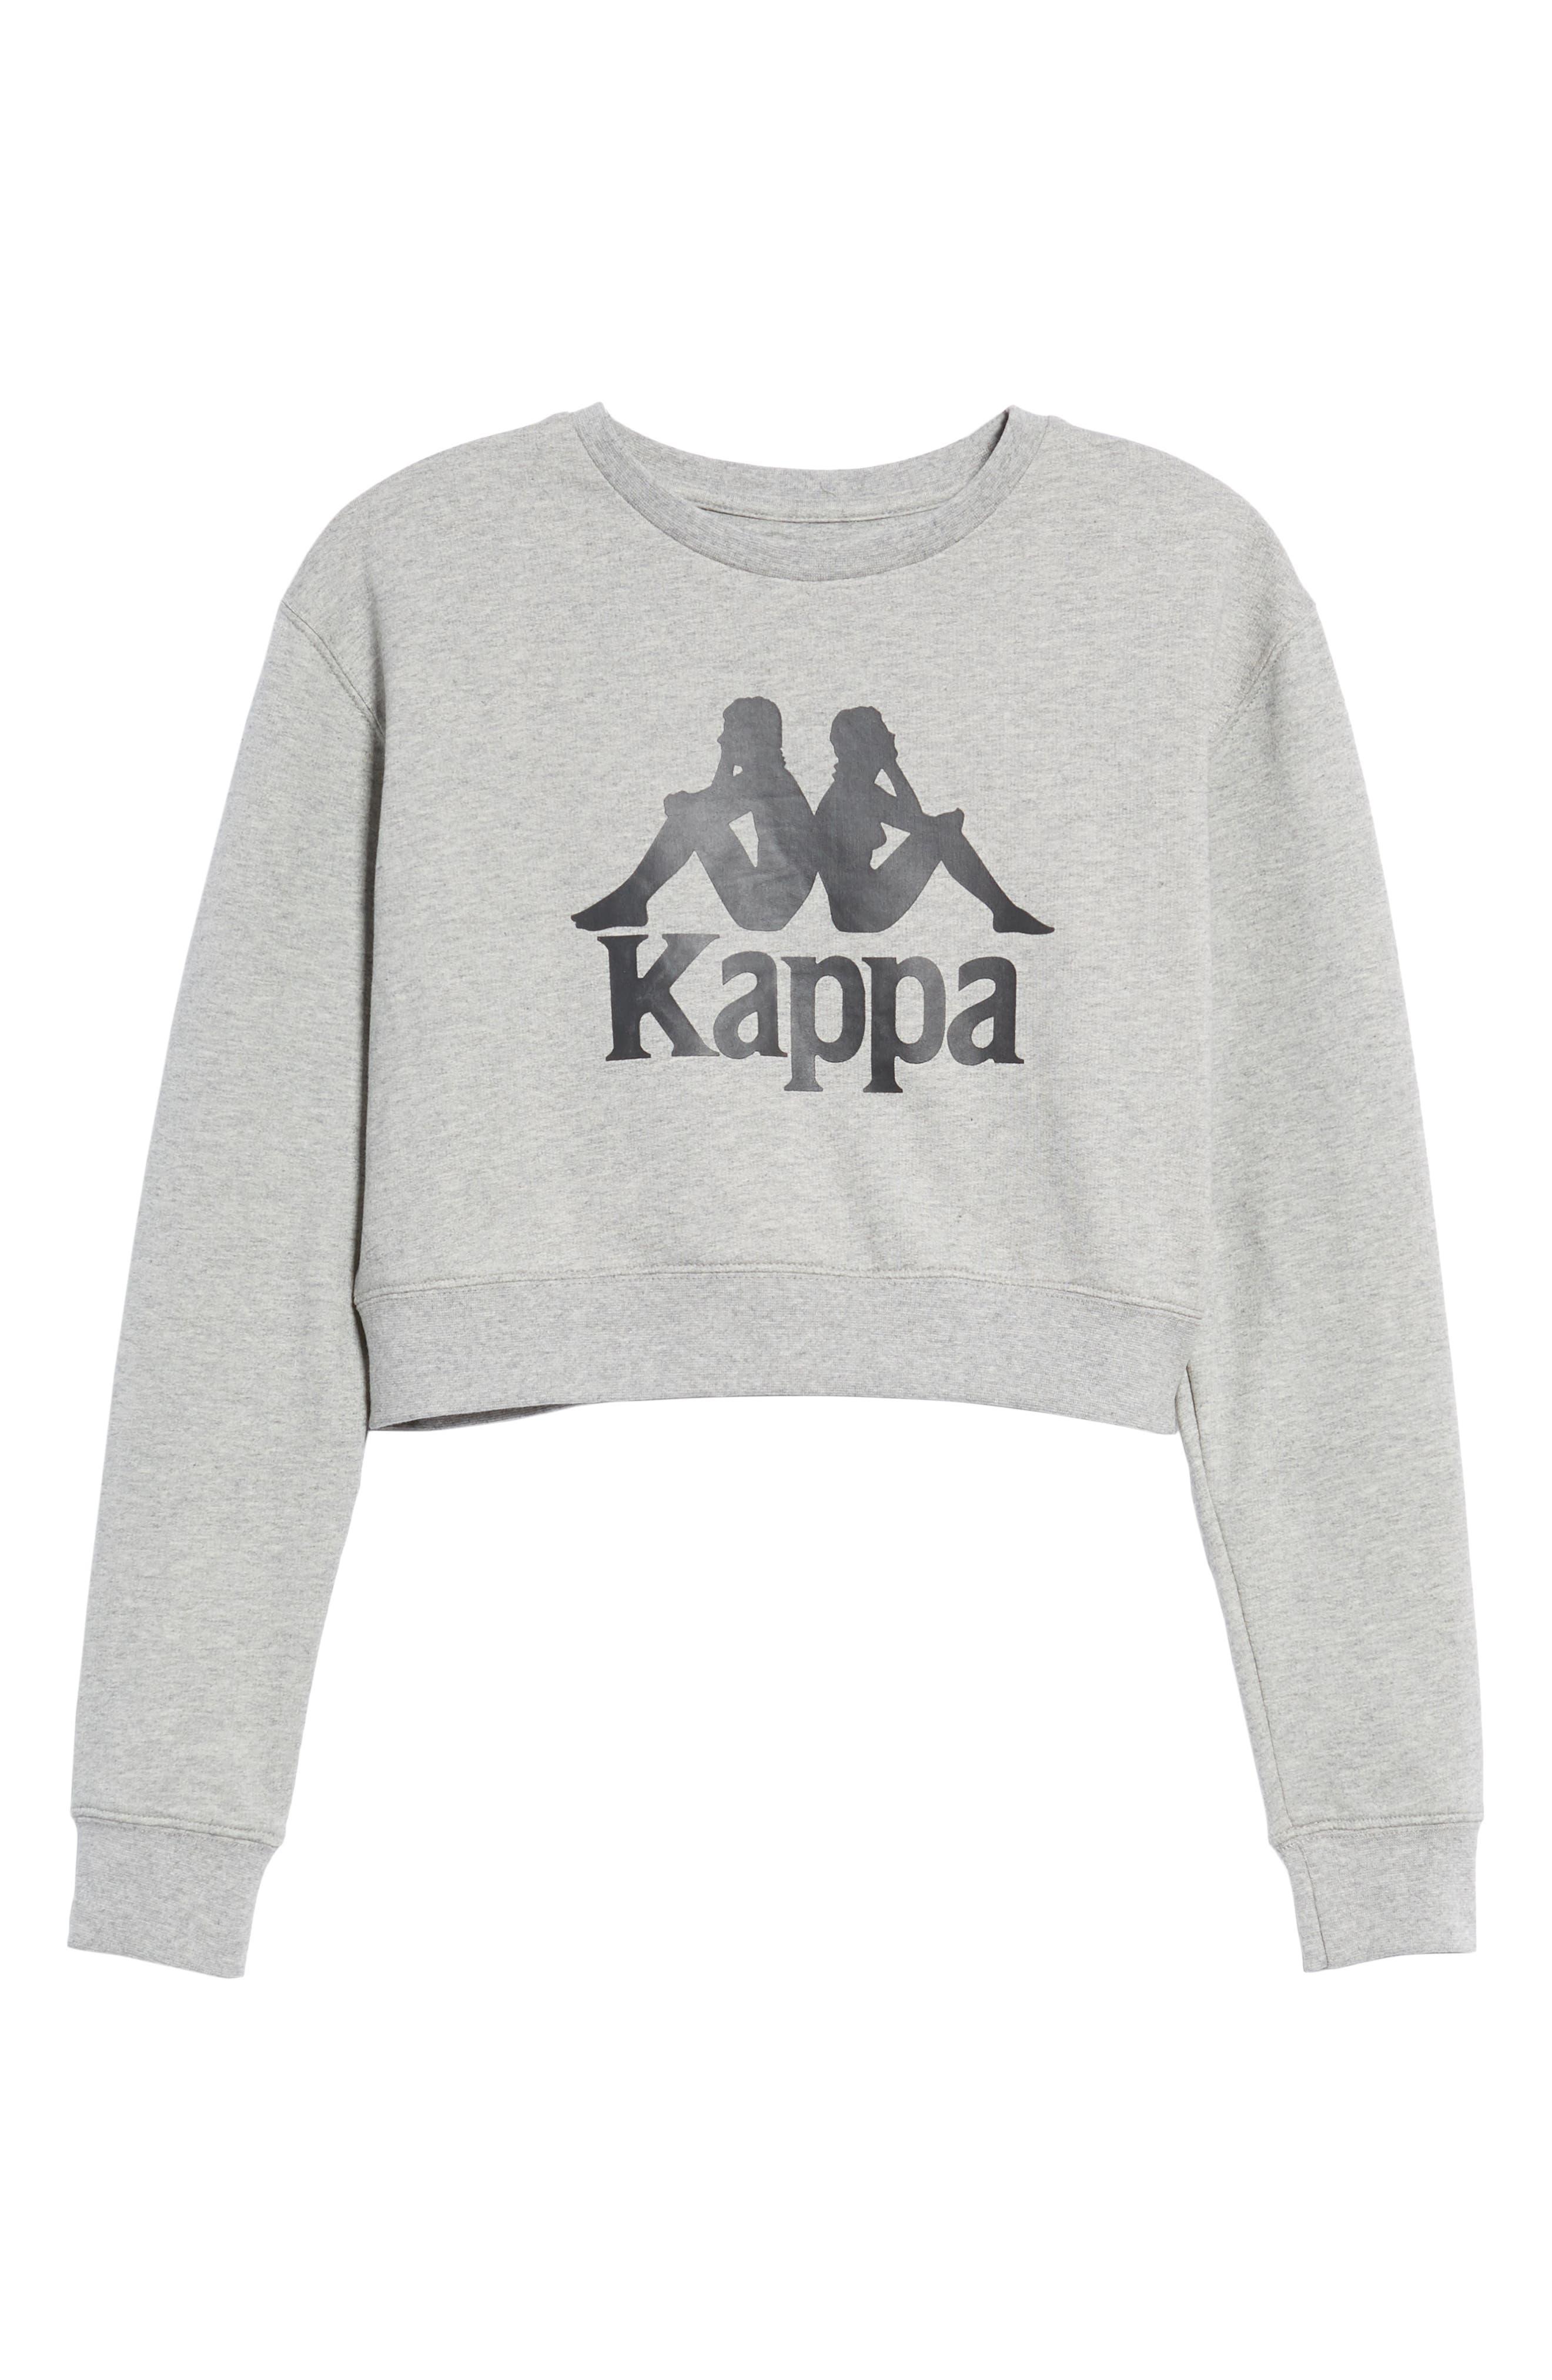 Bamm Bamm Crop Sweatshirt,                             Alternate thumbnail 22, color,